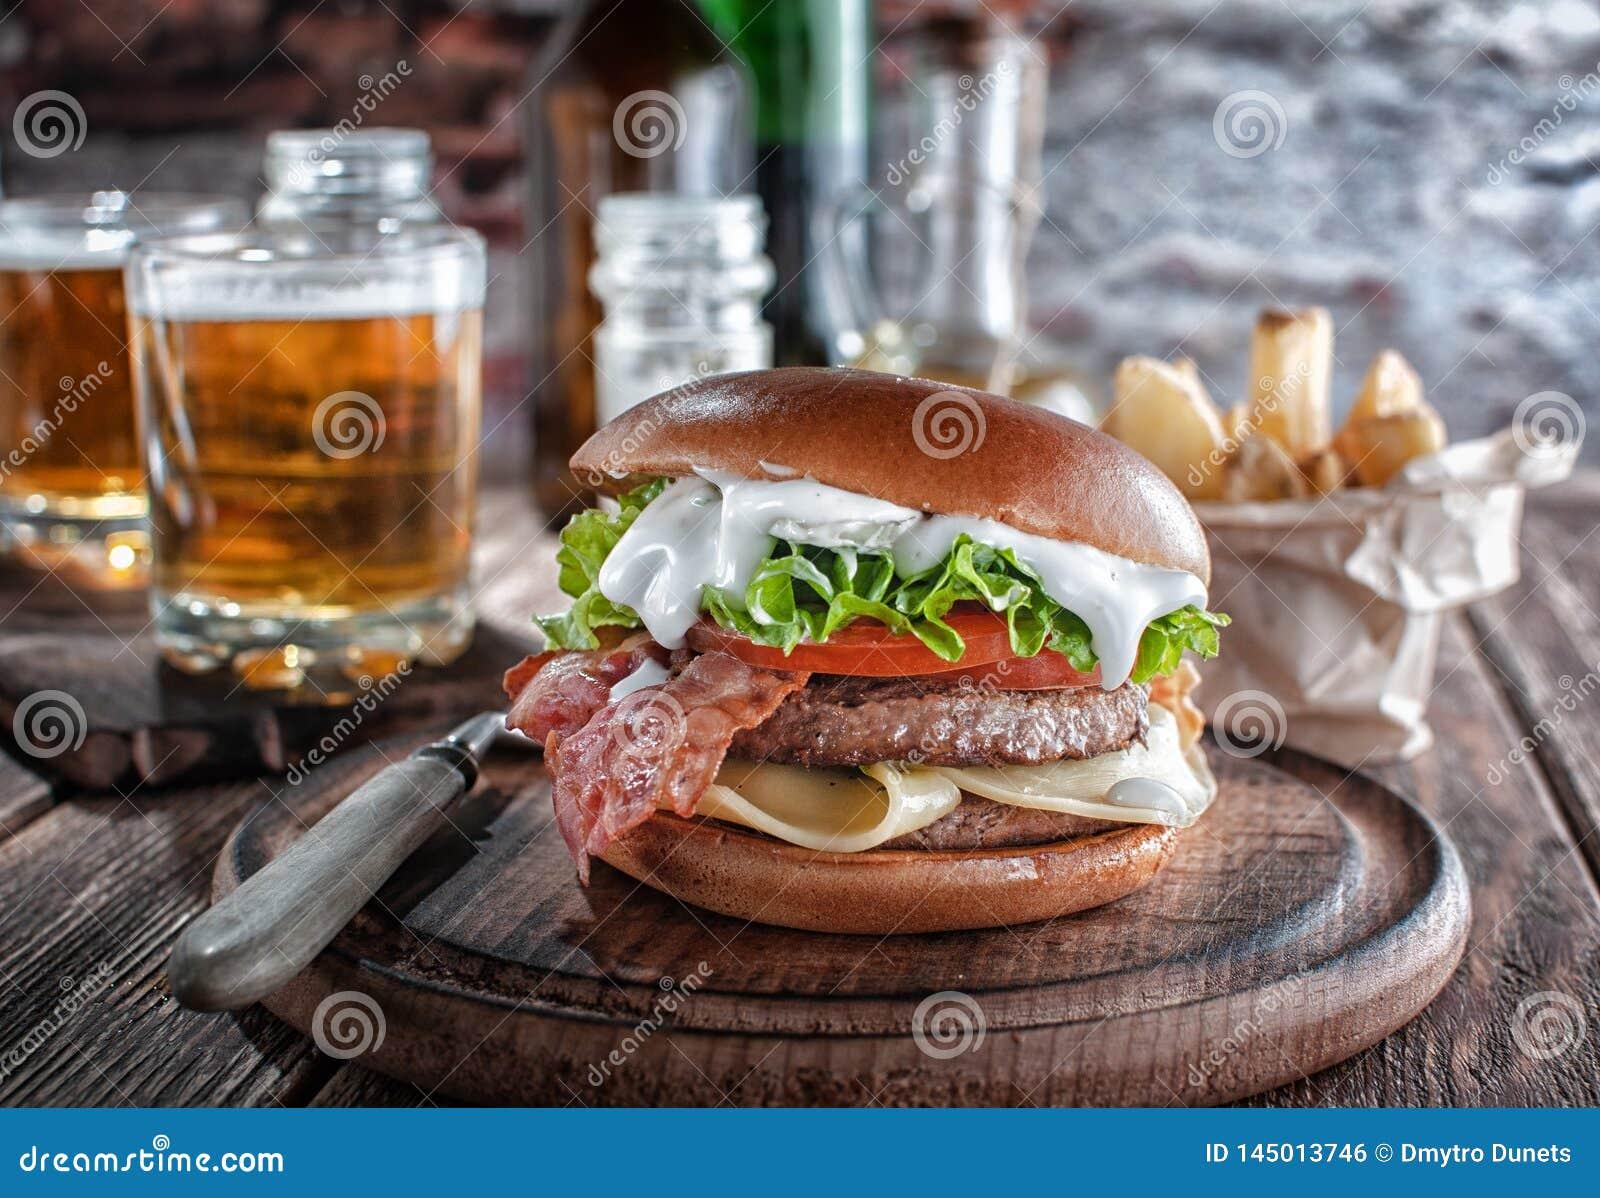 Burger πιάνων με το μπέϊκον και cutlet με το τυρί, ντομάτα, πράσινα